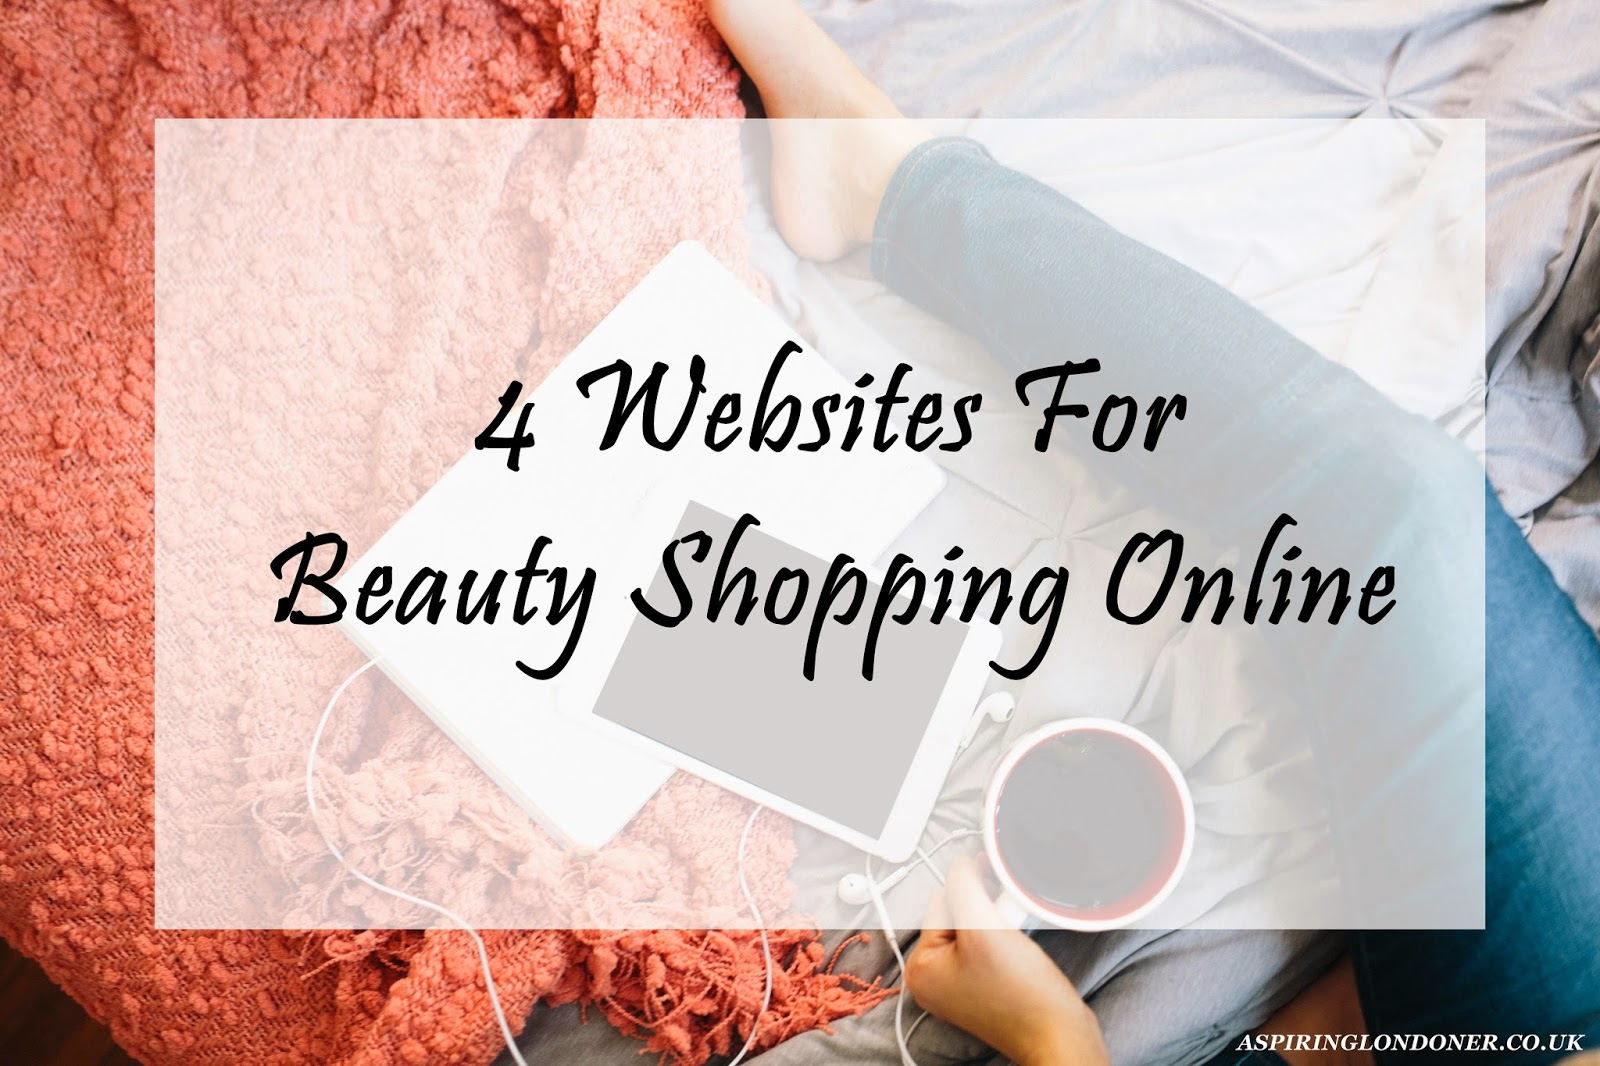 4 Essential Websites for Beauty Shopping Online - Aspiring Londoner